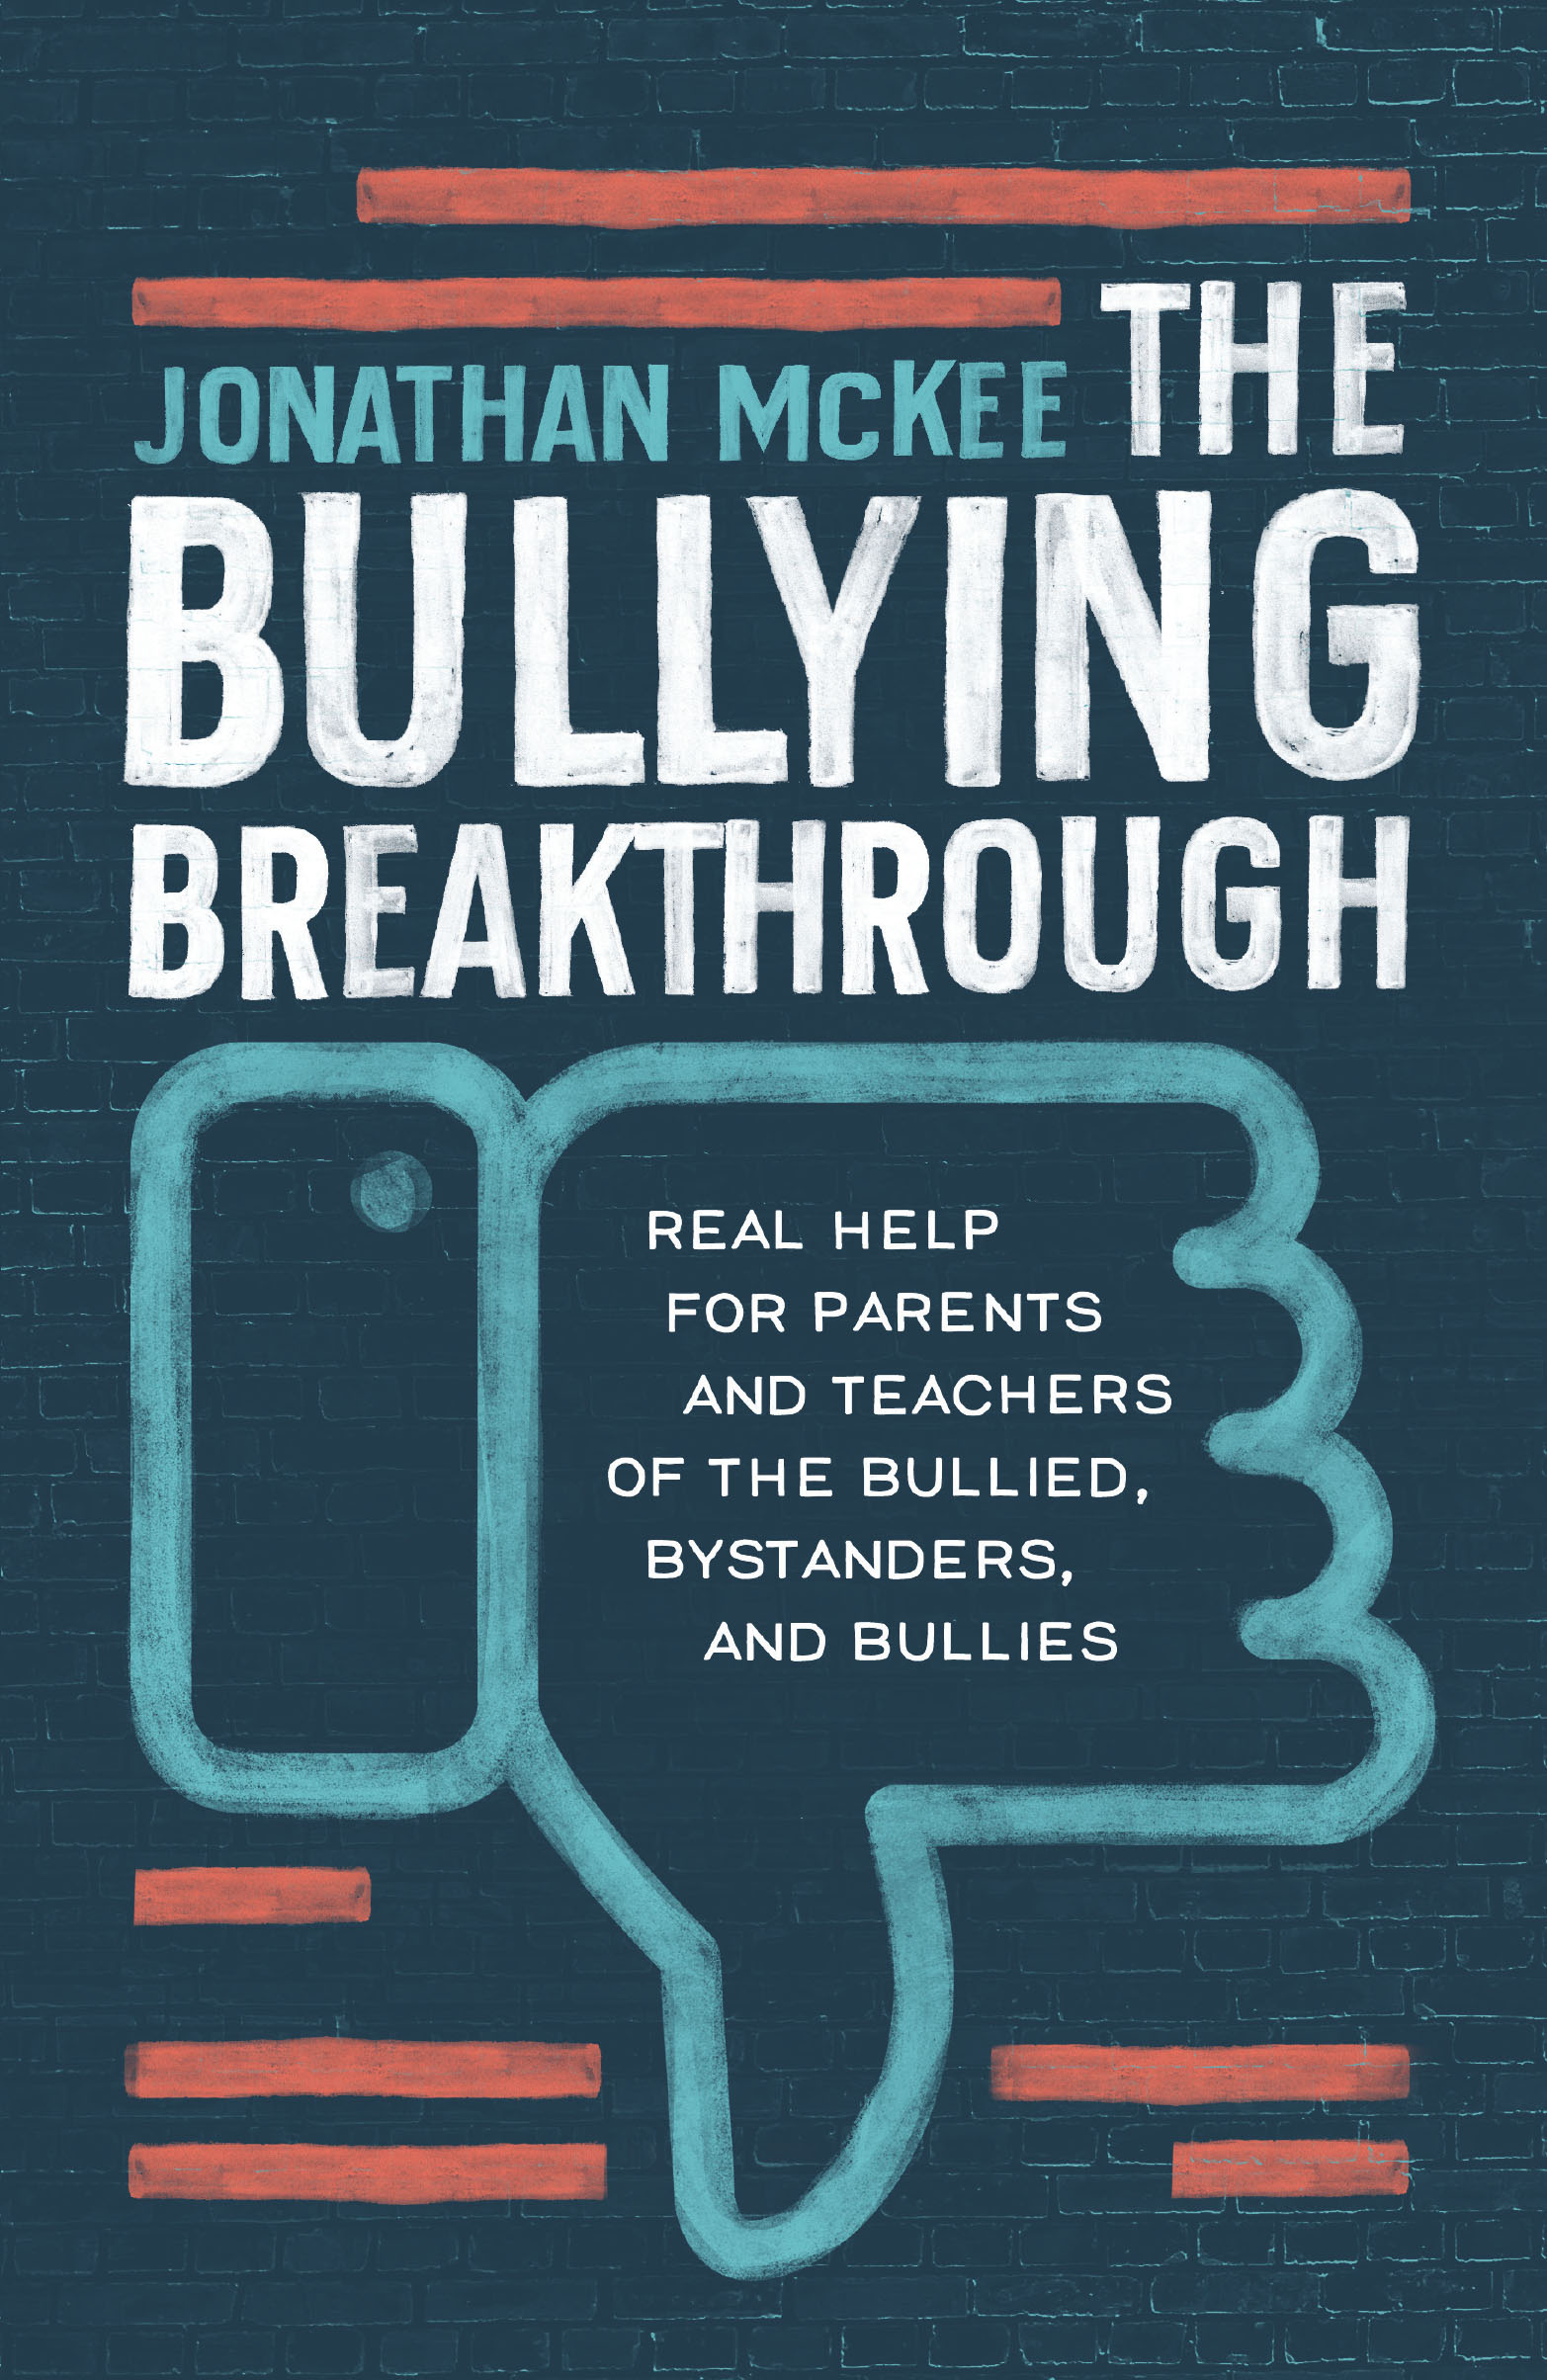 BullyingBreakthrough.indd